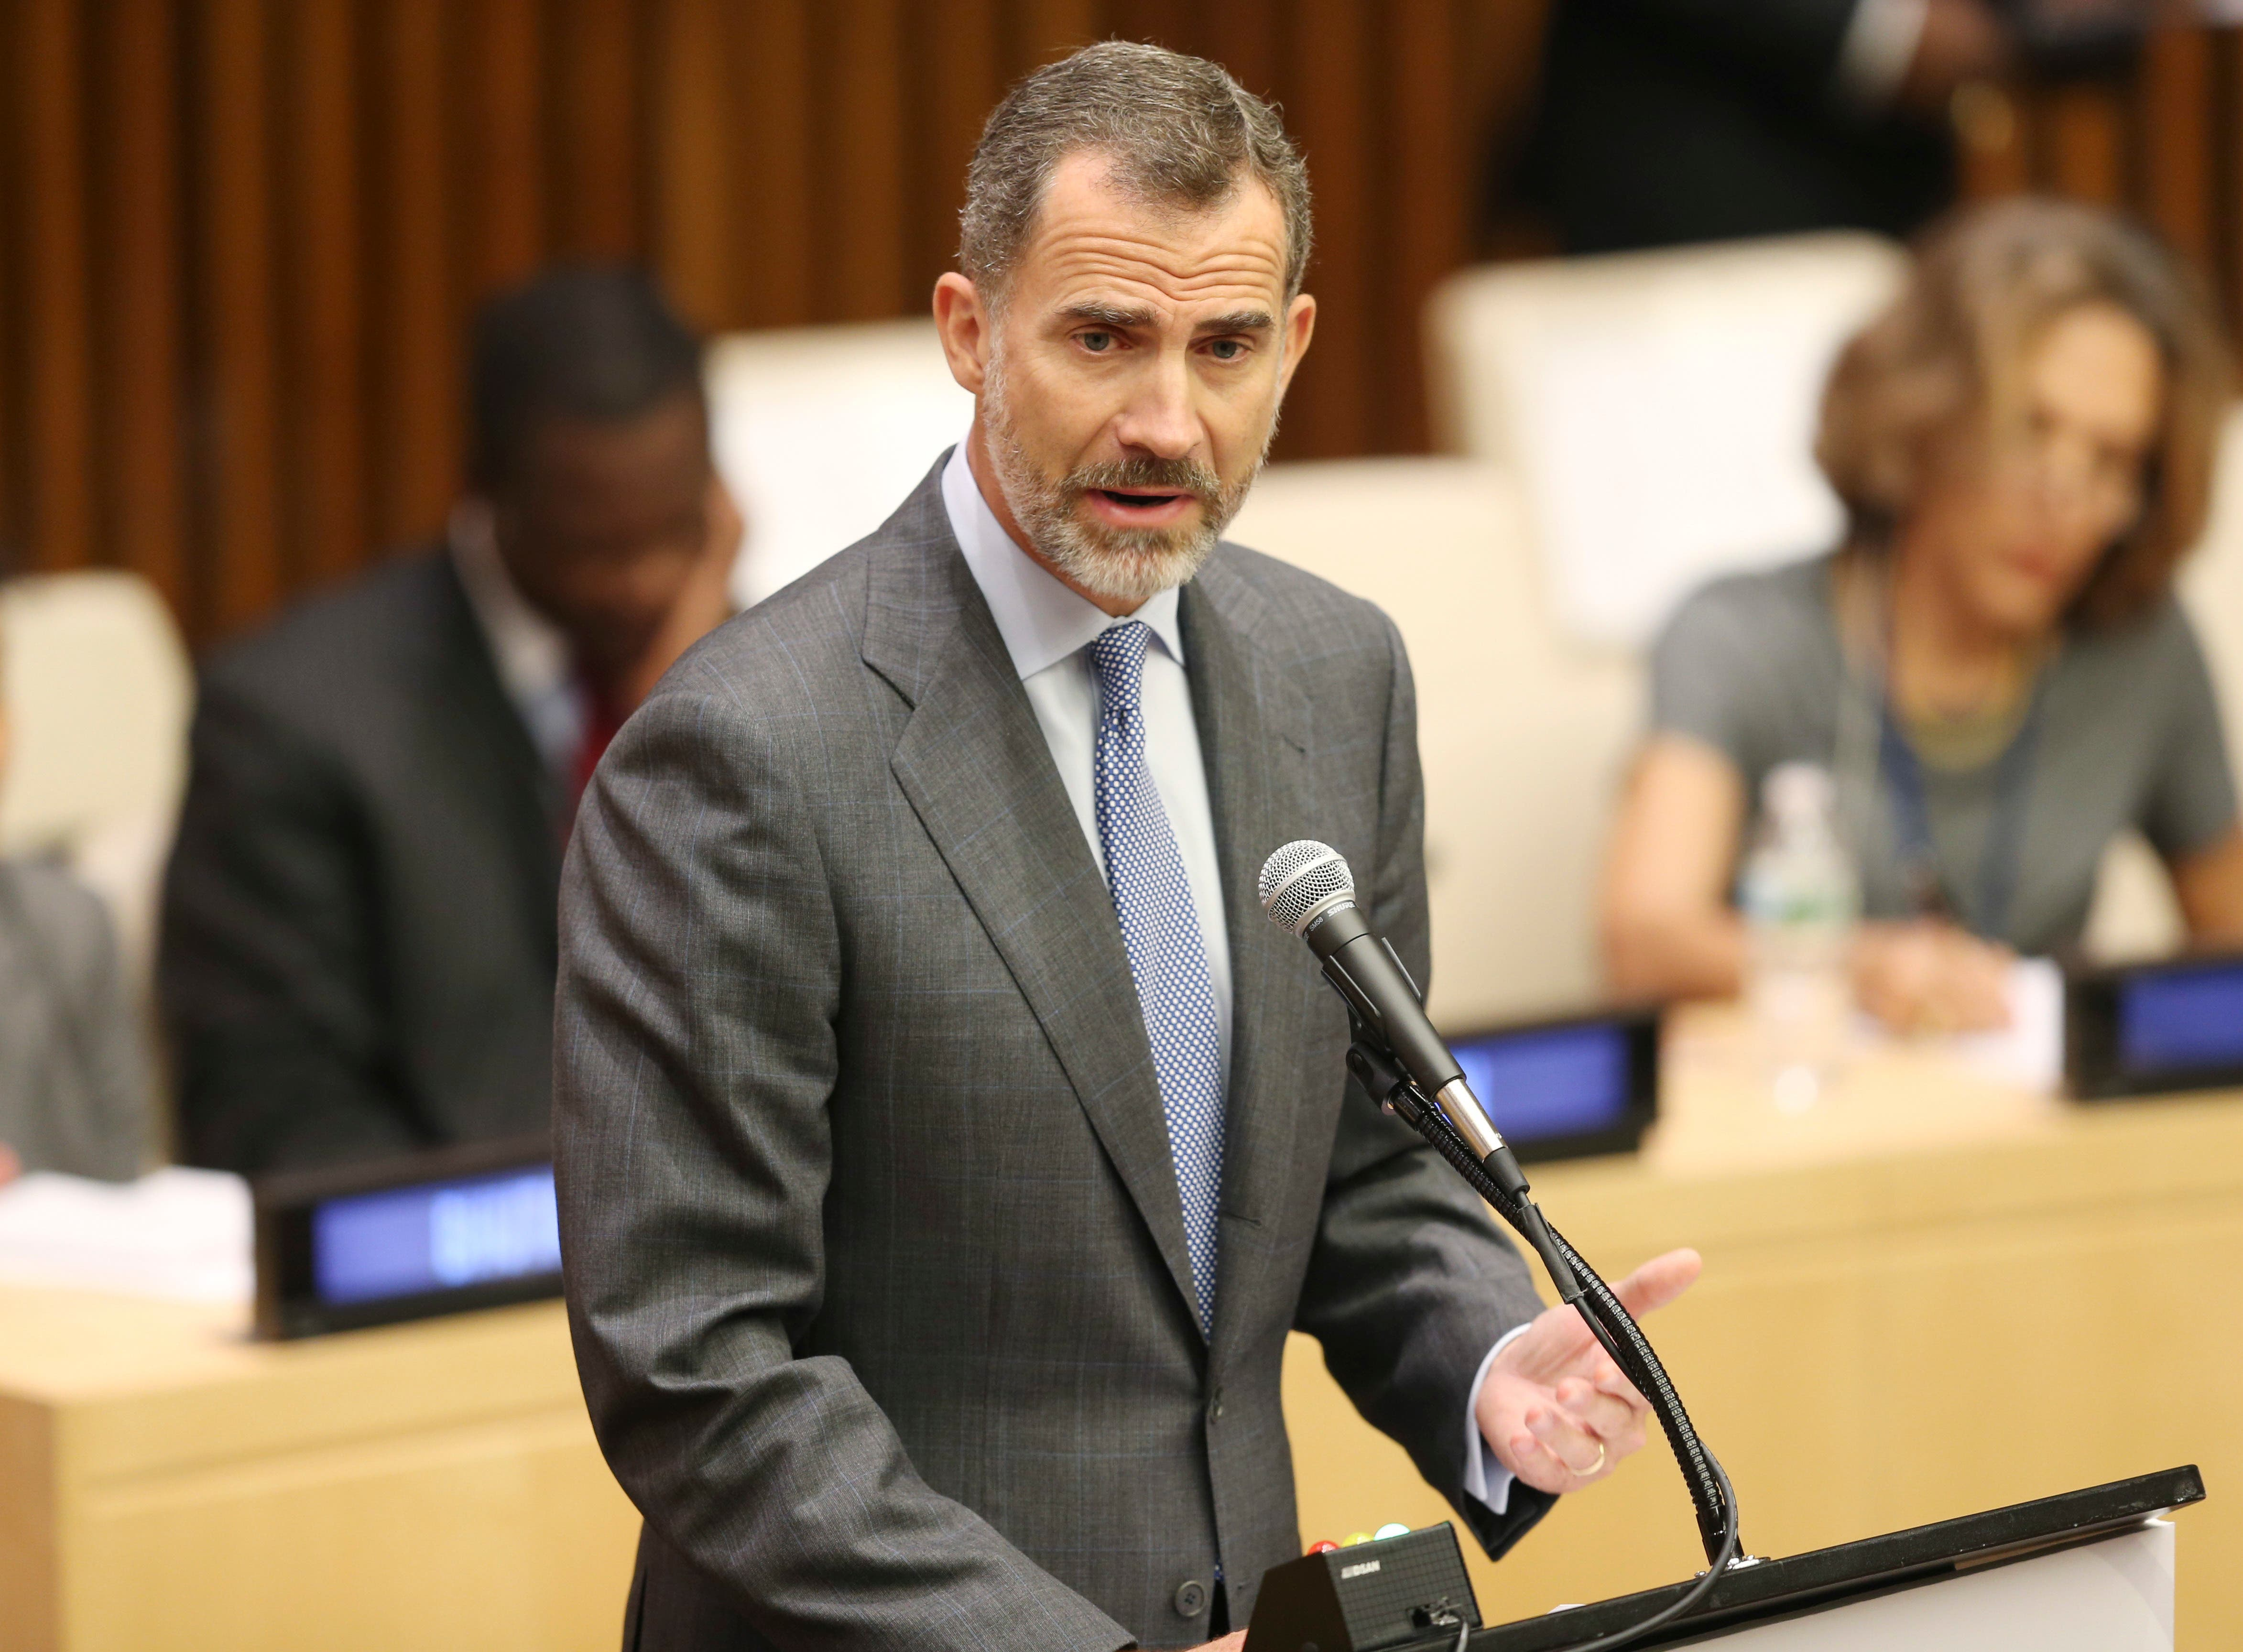 Felipe VI destaca que refugiados deben respetar valores de países de acogida